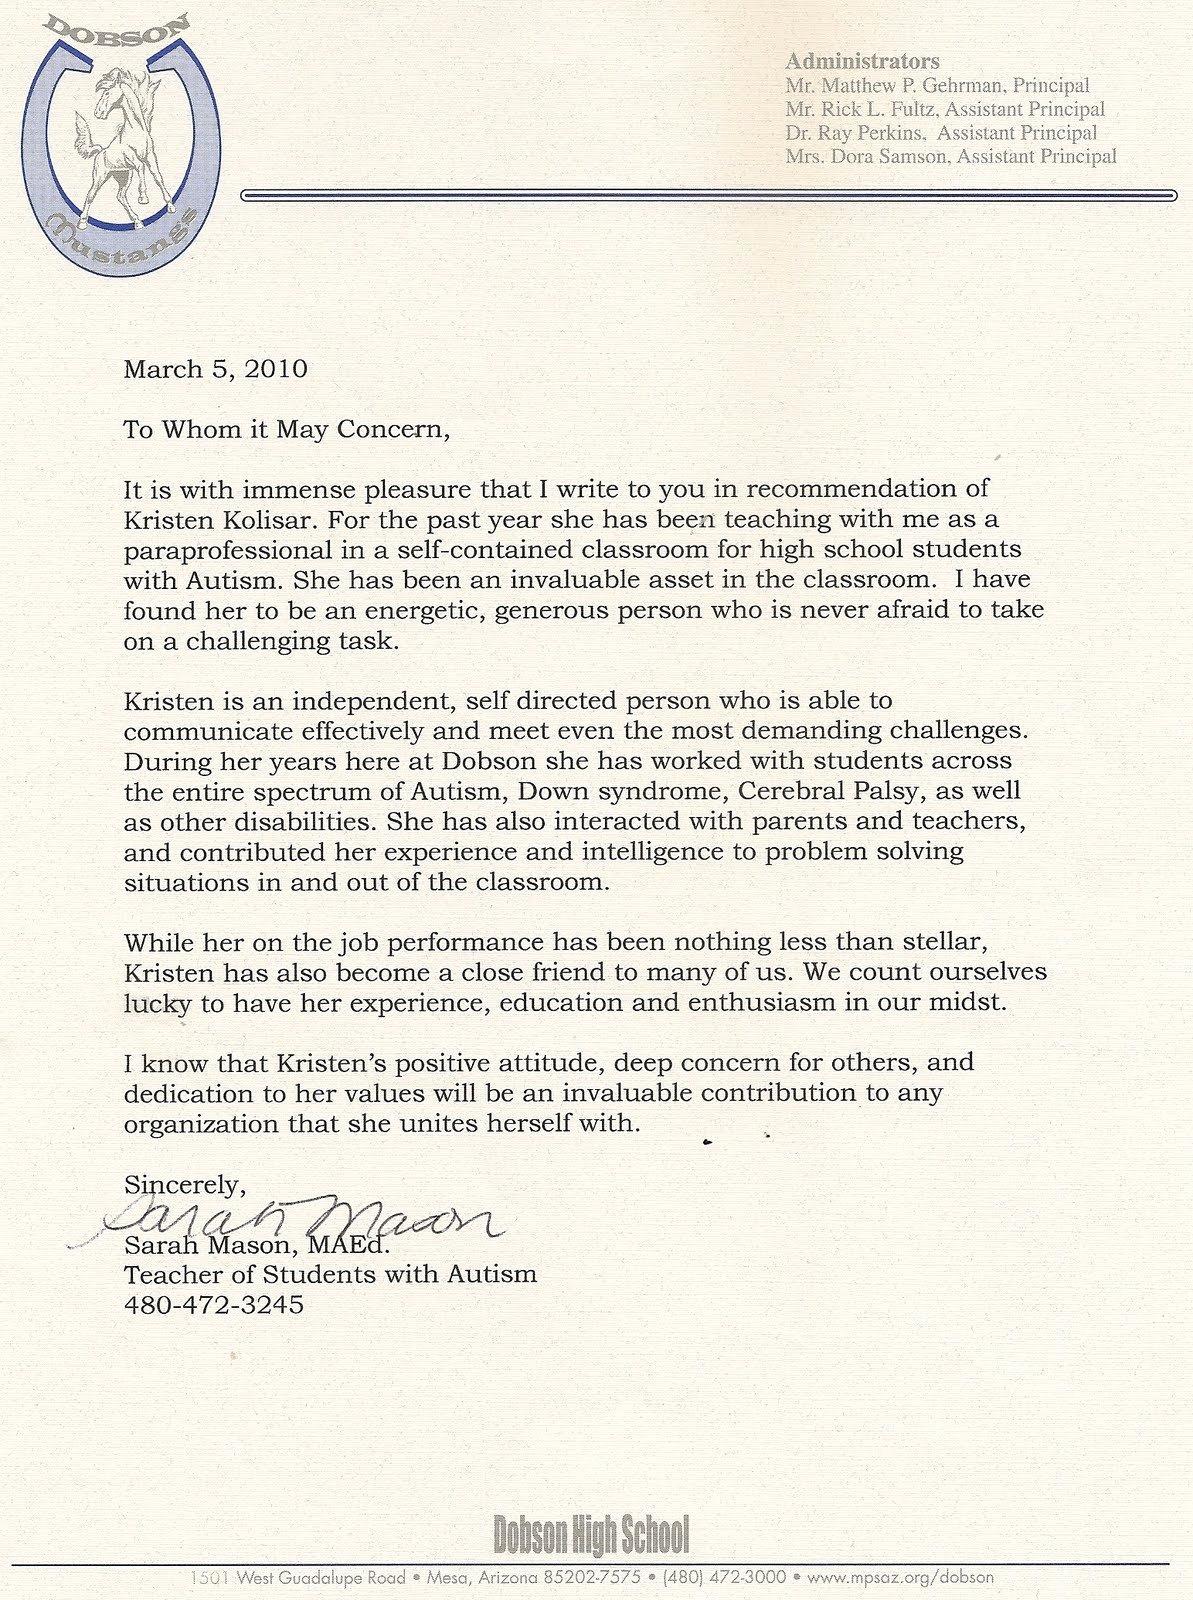 Internship Letter Of Recommendation Elegant Bis401 Internship